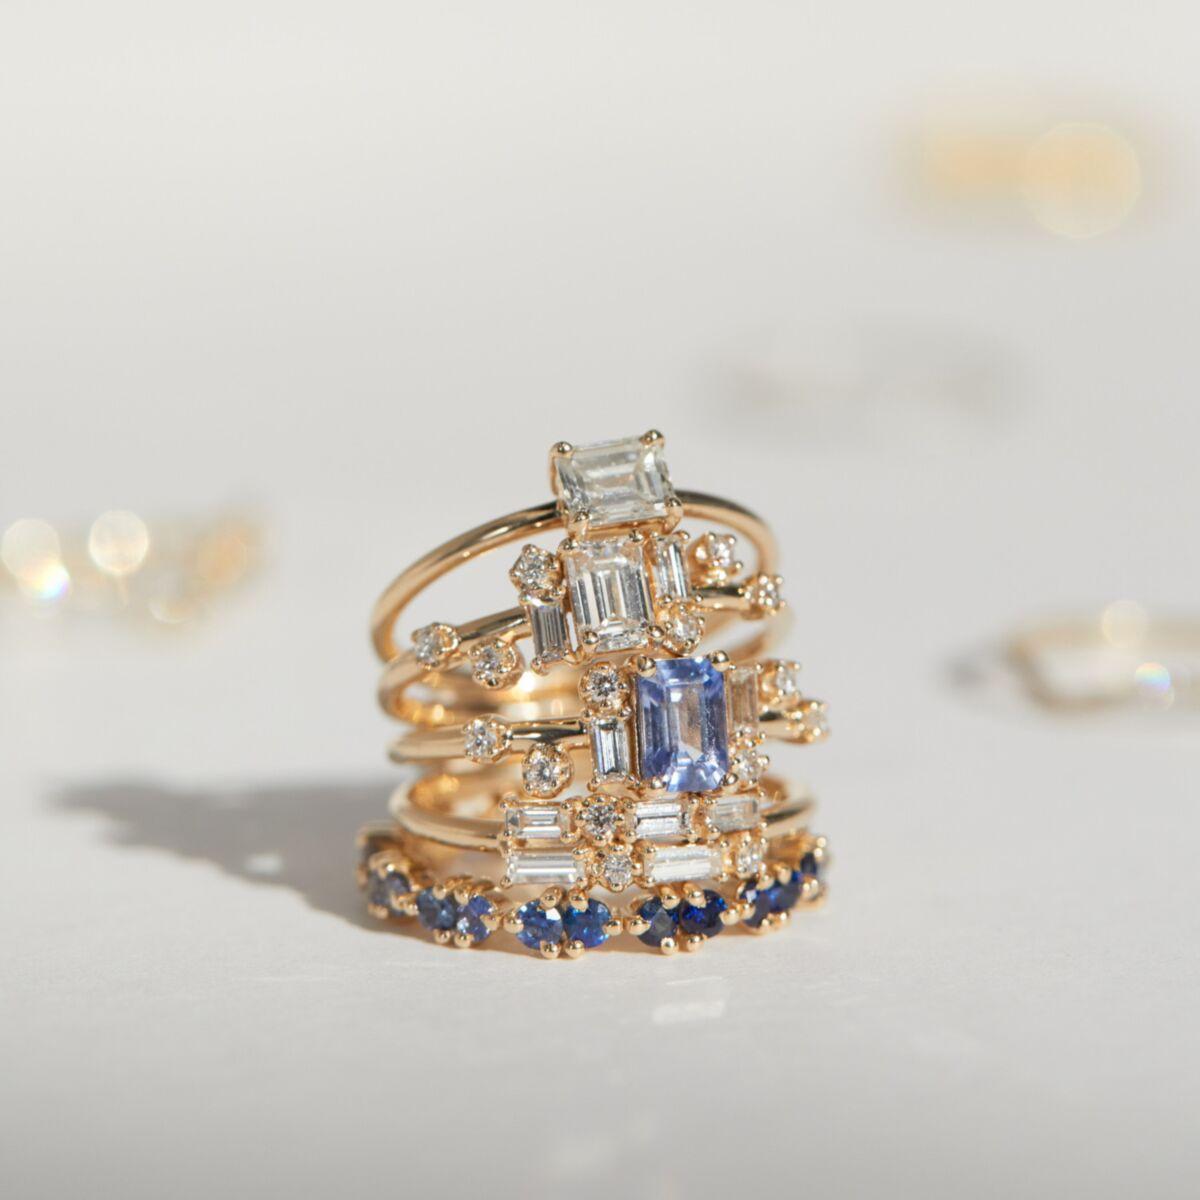 Emerald Cut Diamond Solitaire Ring image